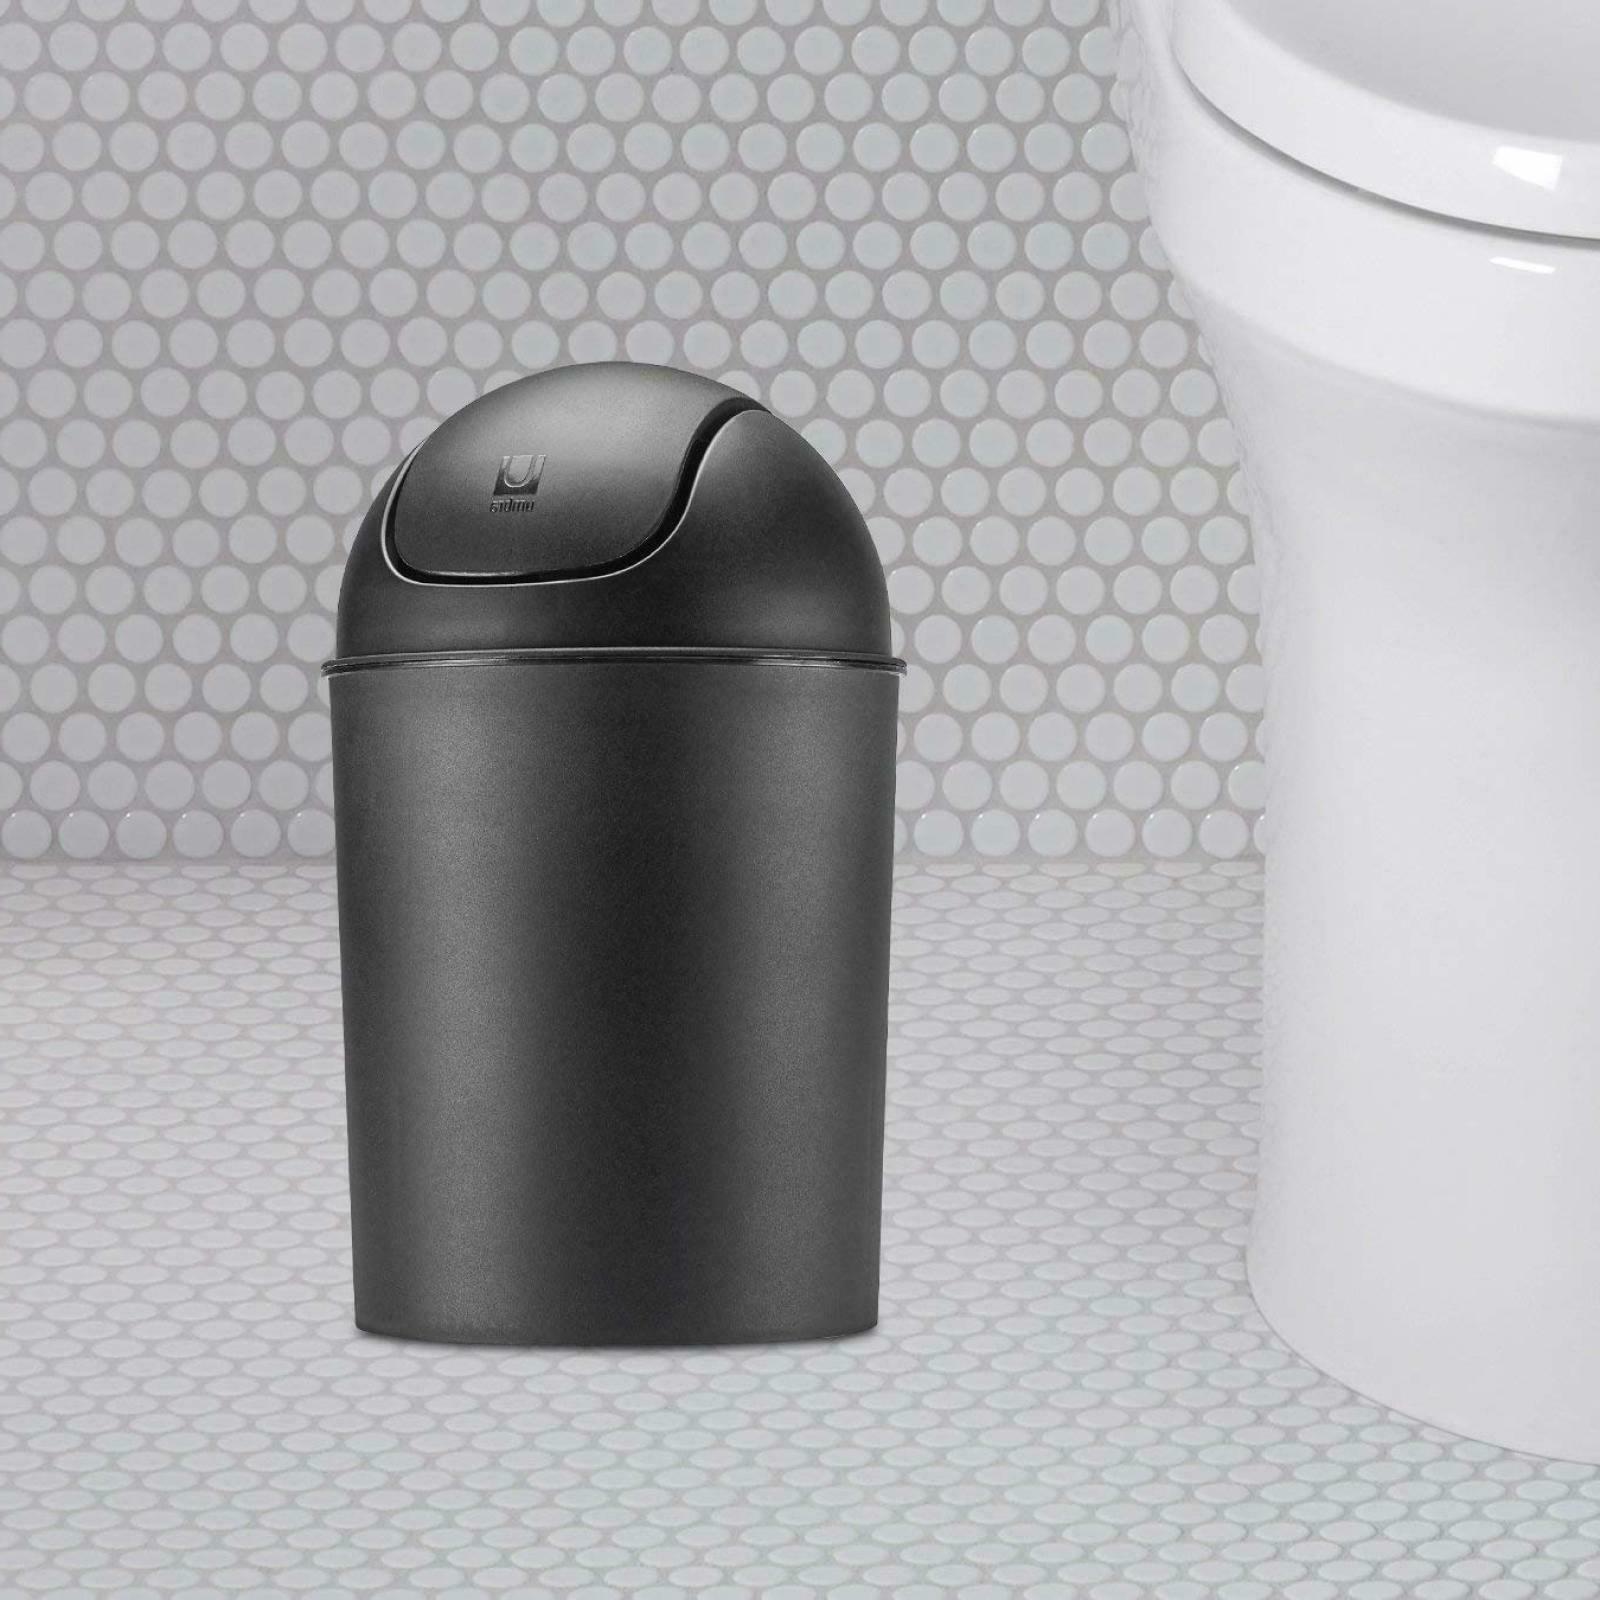 Small Trash Can Swing Waste Basket Bin 1.5 gallon